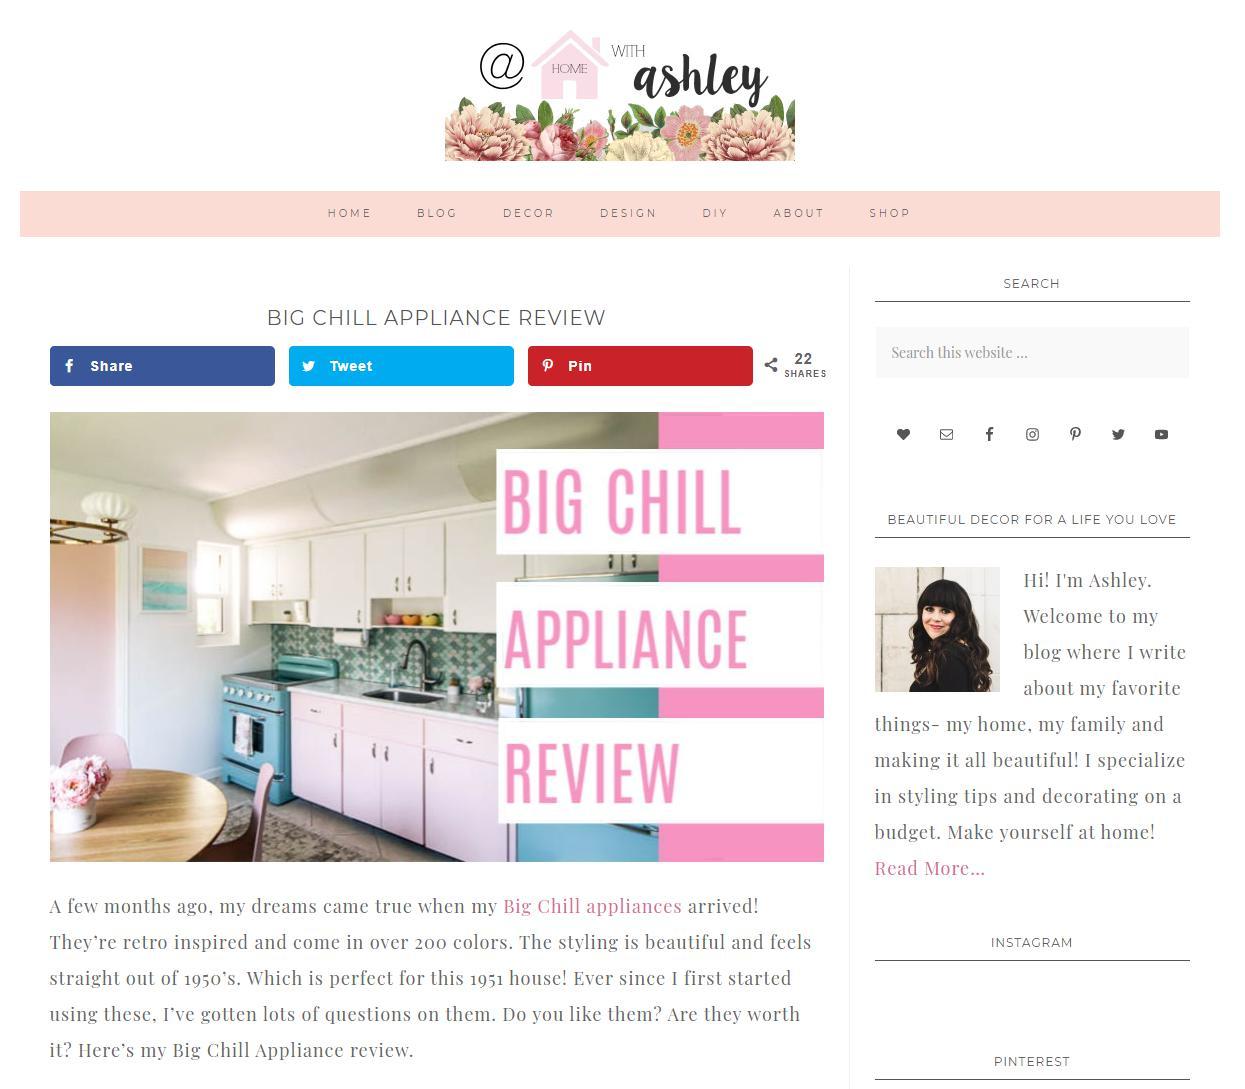 At Home with Ashley Blog – May 7th, 2020